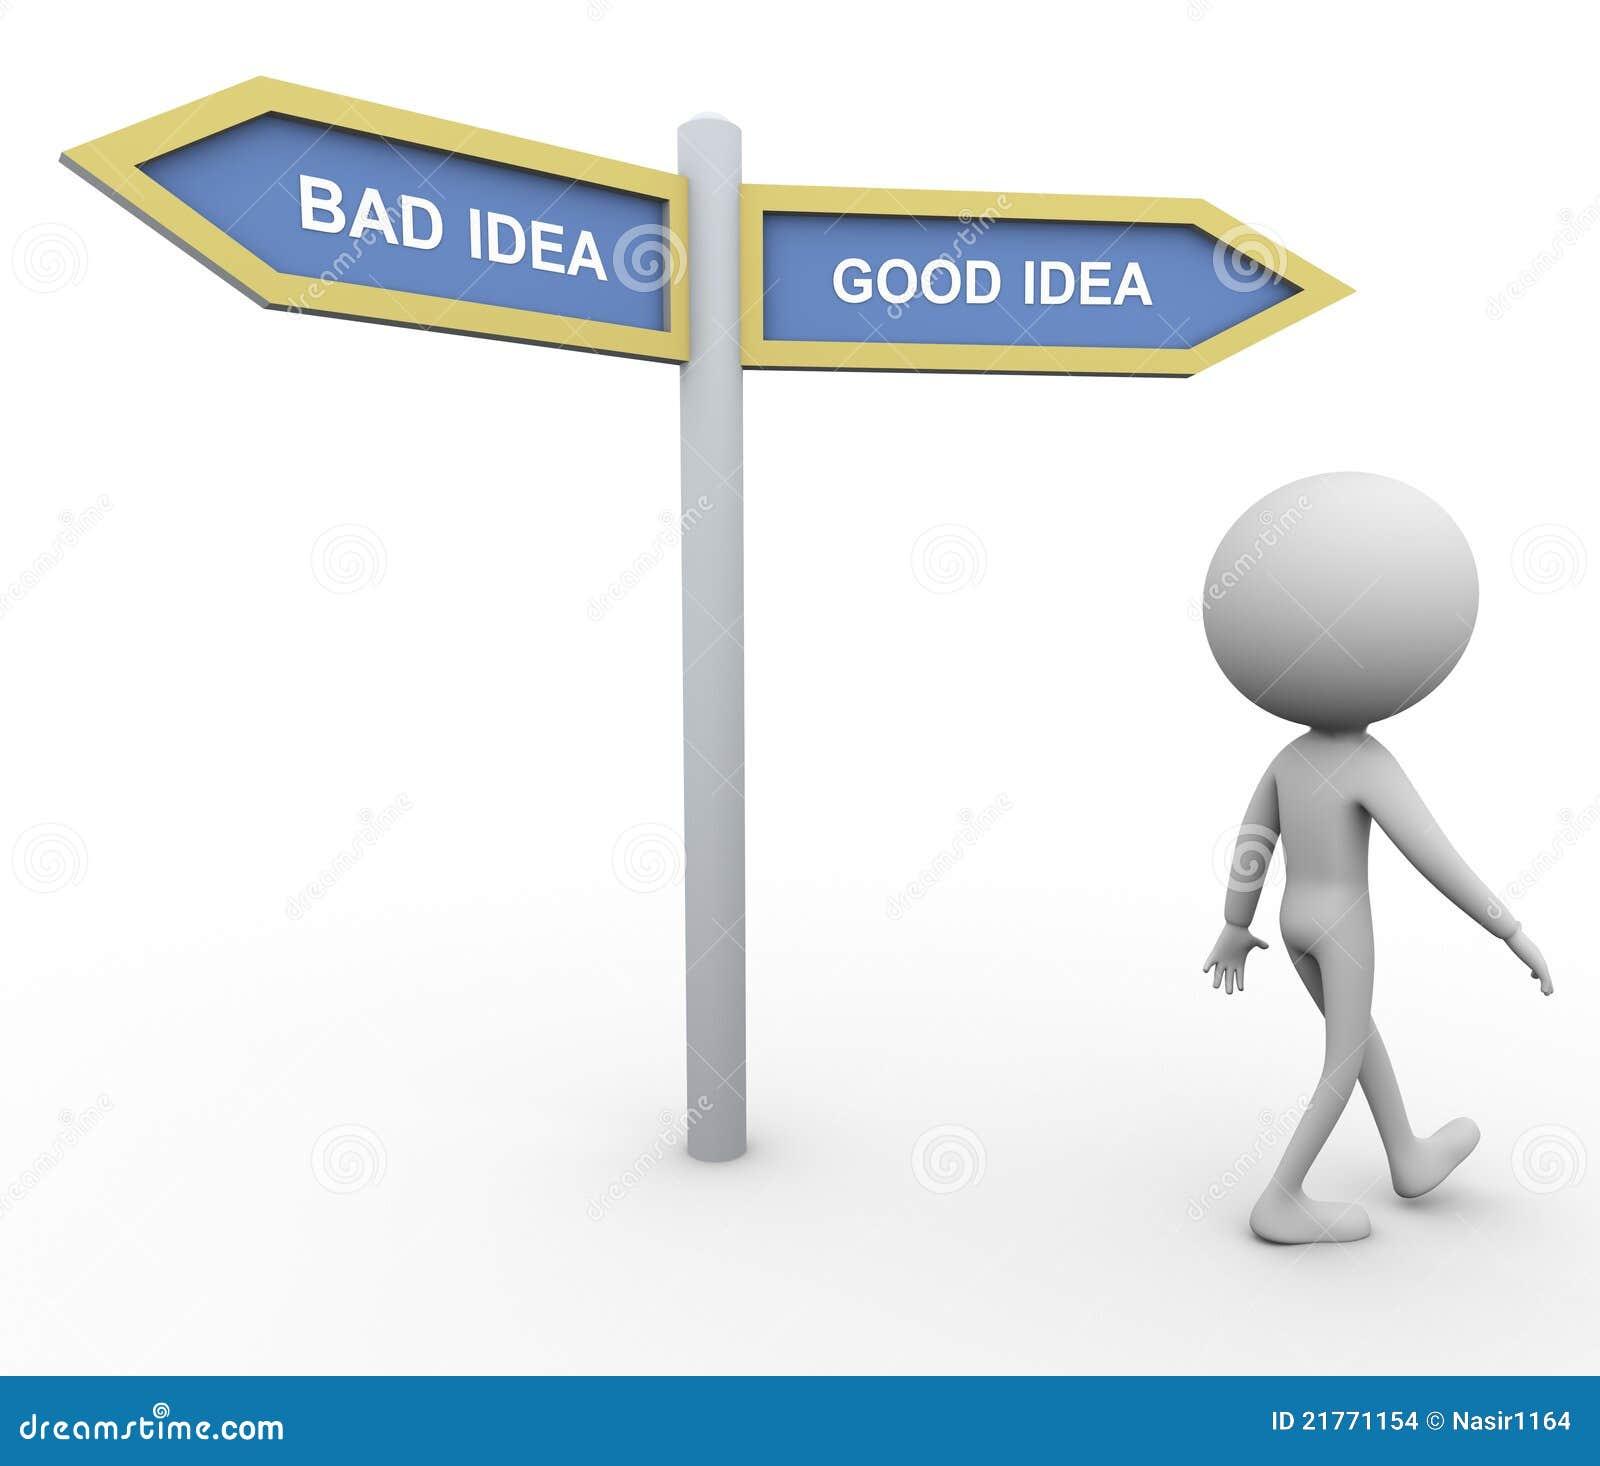 bad idea good idea stock images image 21771154. Black Bedroom Furniture Sets. Home Design Ideas